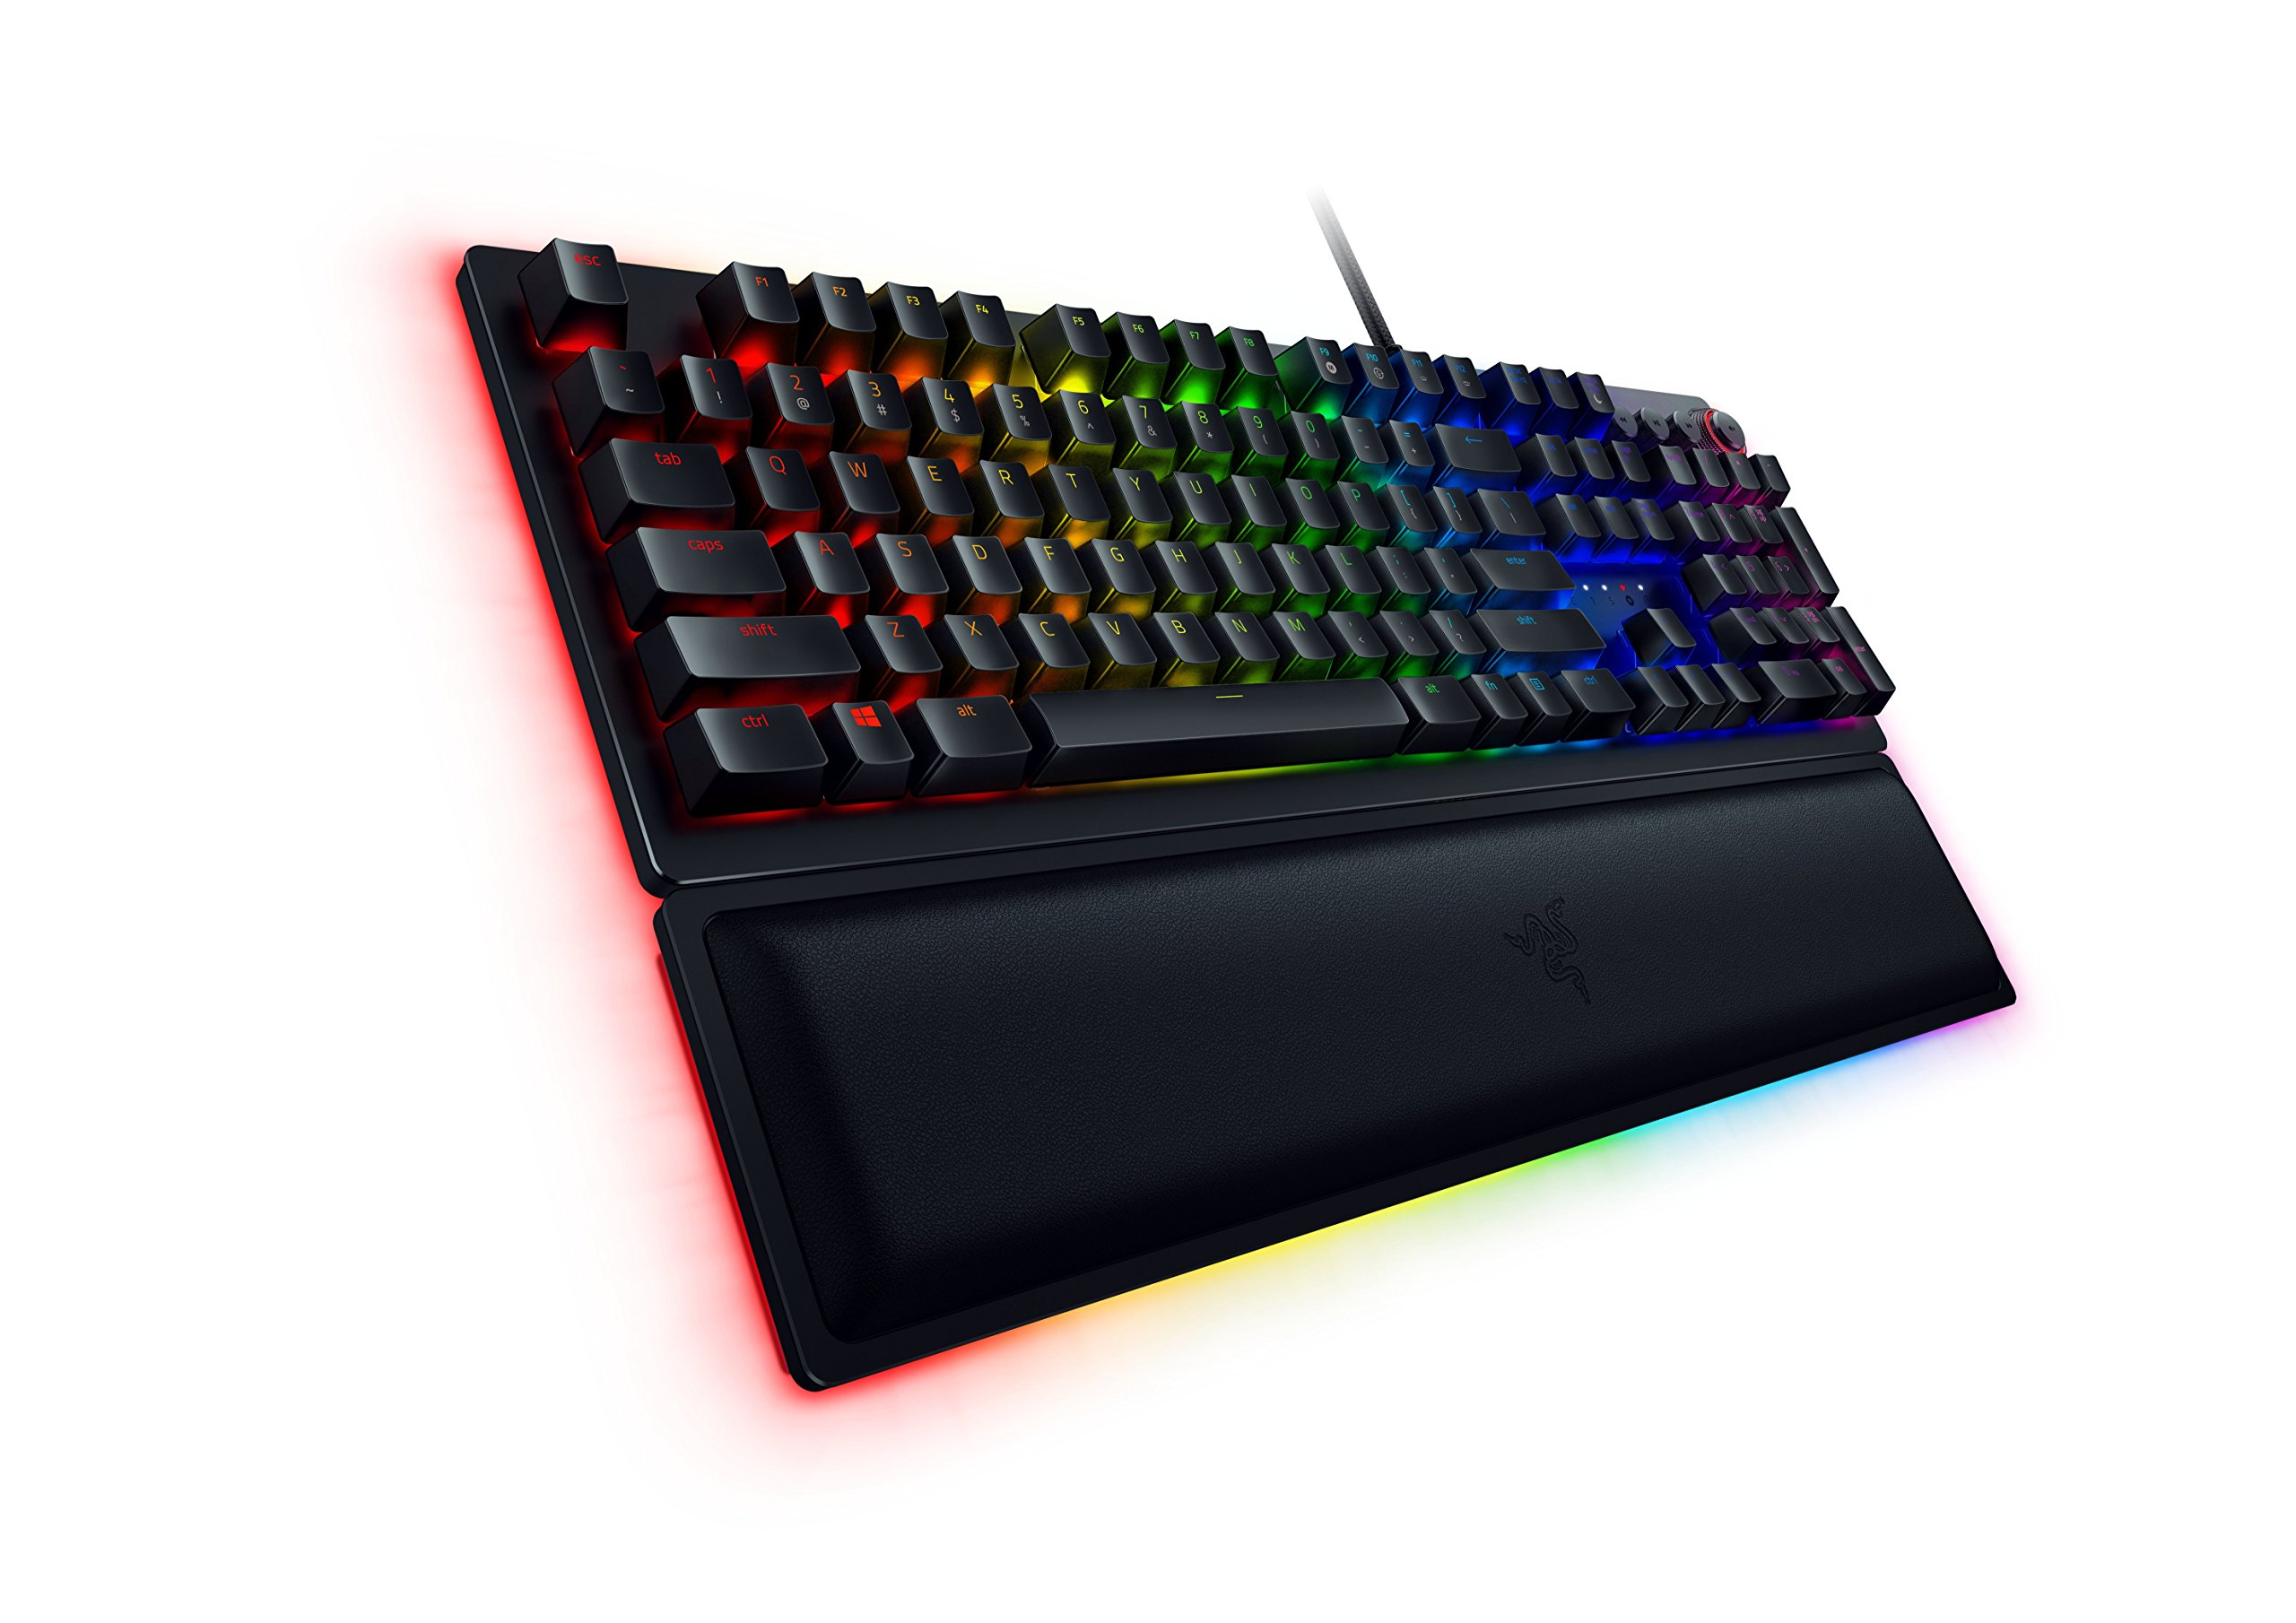 Razer Huntsman Elite Gaming Keyboard: Opto-Mechanical Key Switches - Instant Actuation - Chroma RGB Lighting - Magnetic Plush Wrist Rest - Dedicated Media Keys & Dial - Matte Black by Razer